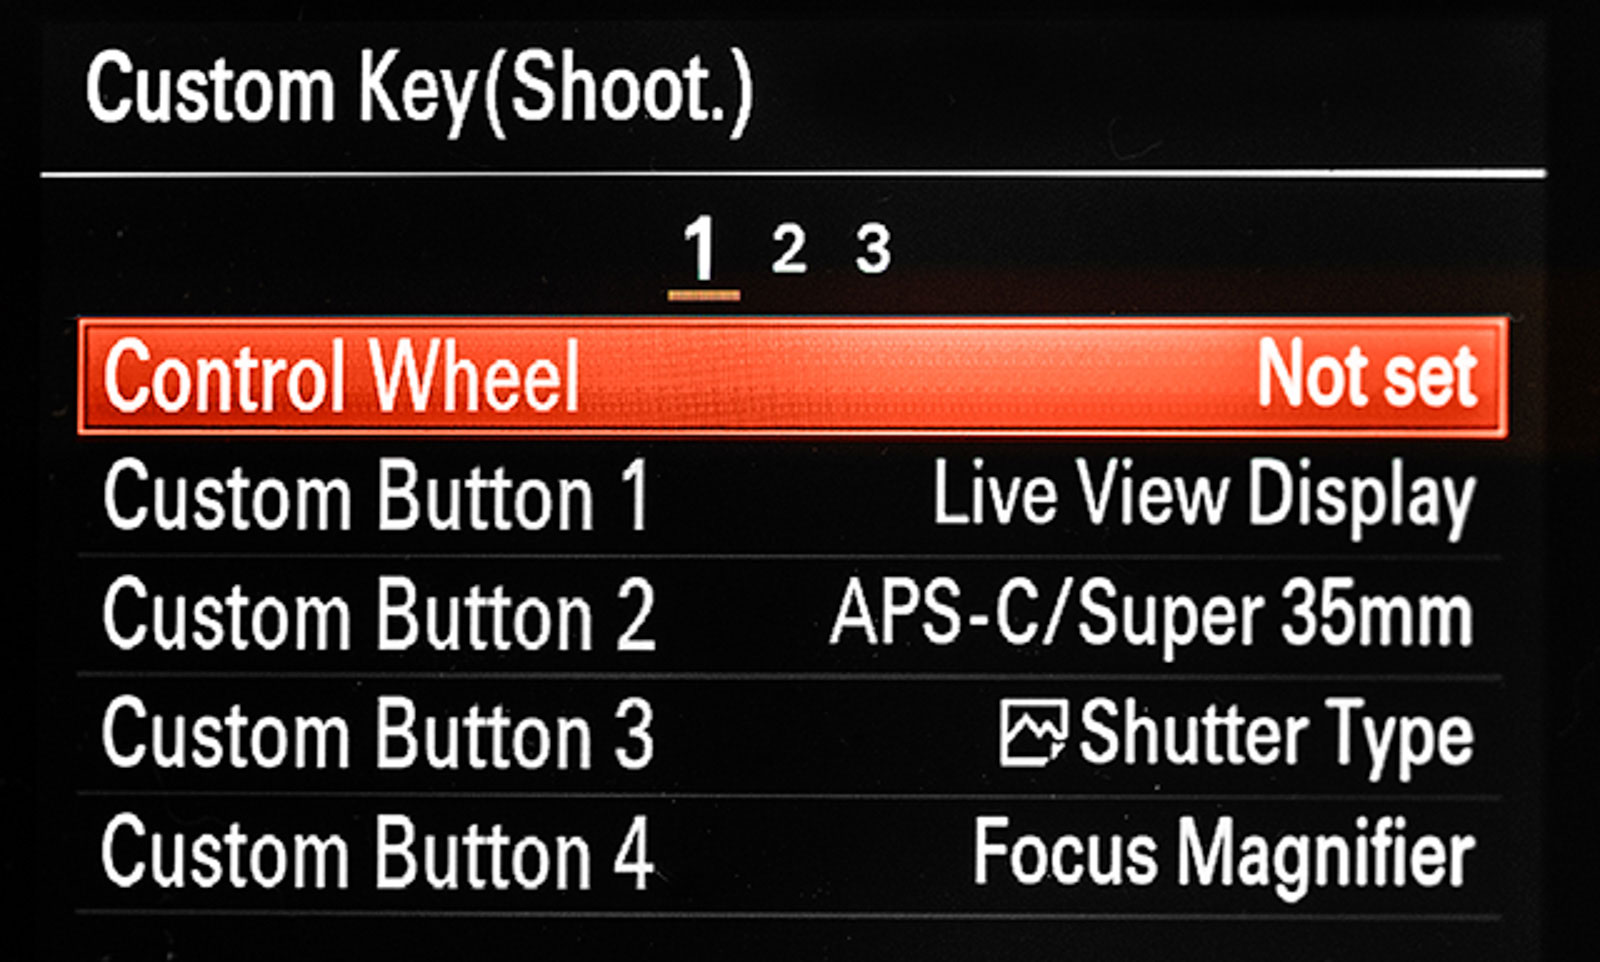 sony a9 custom key settings